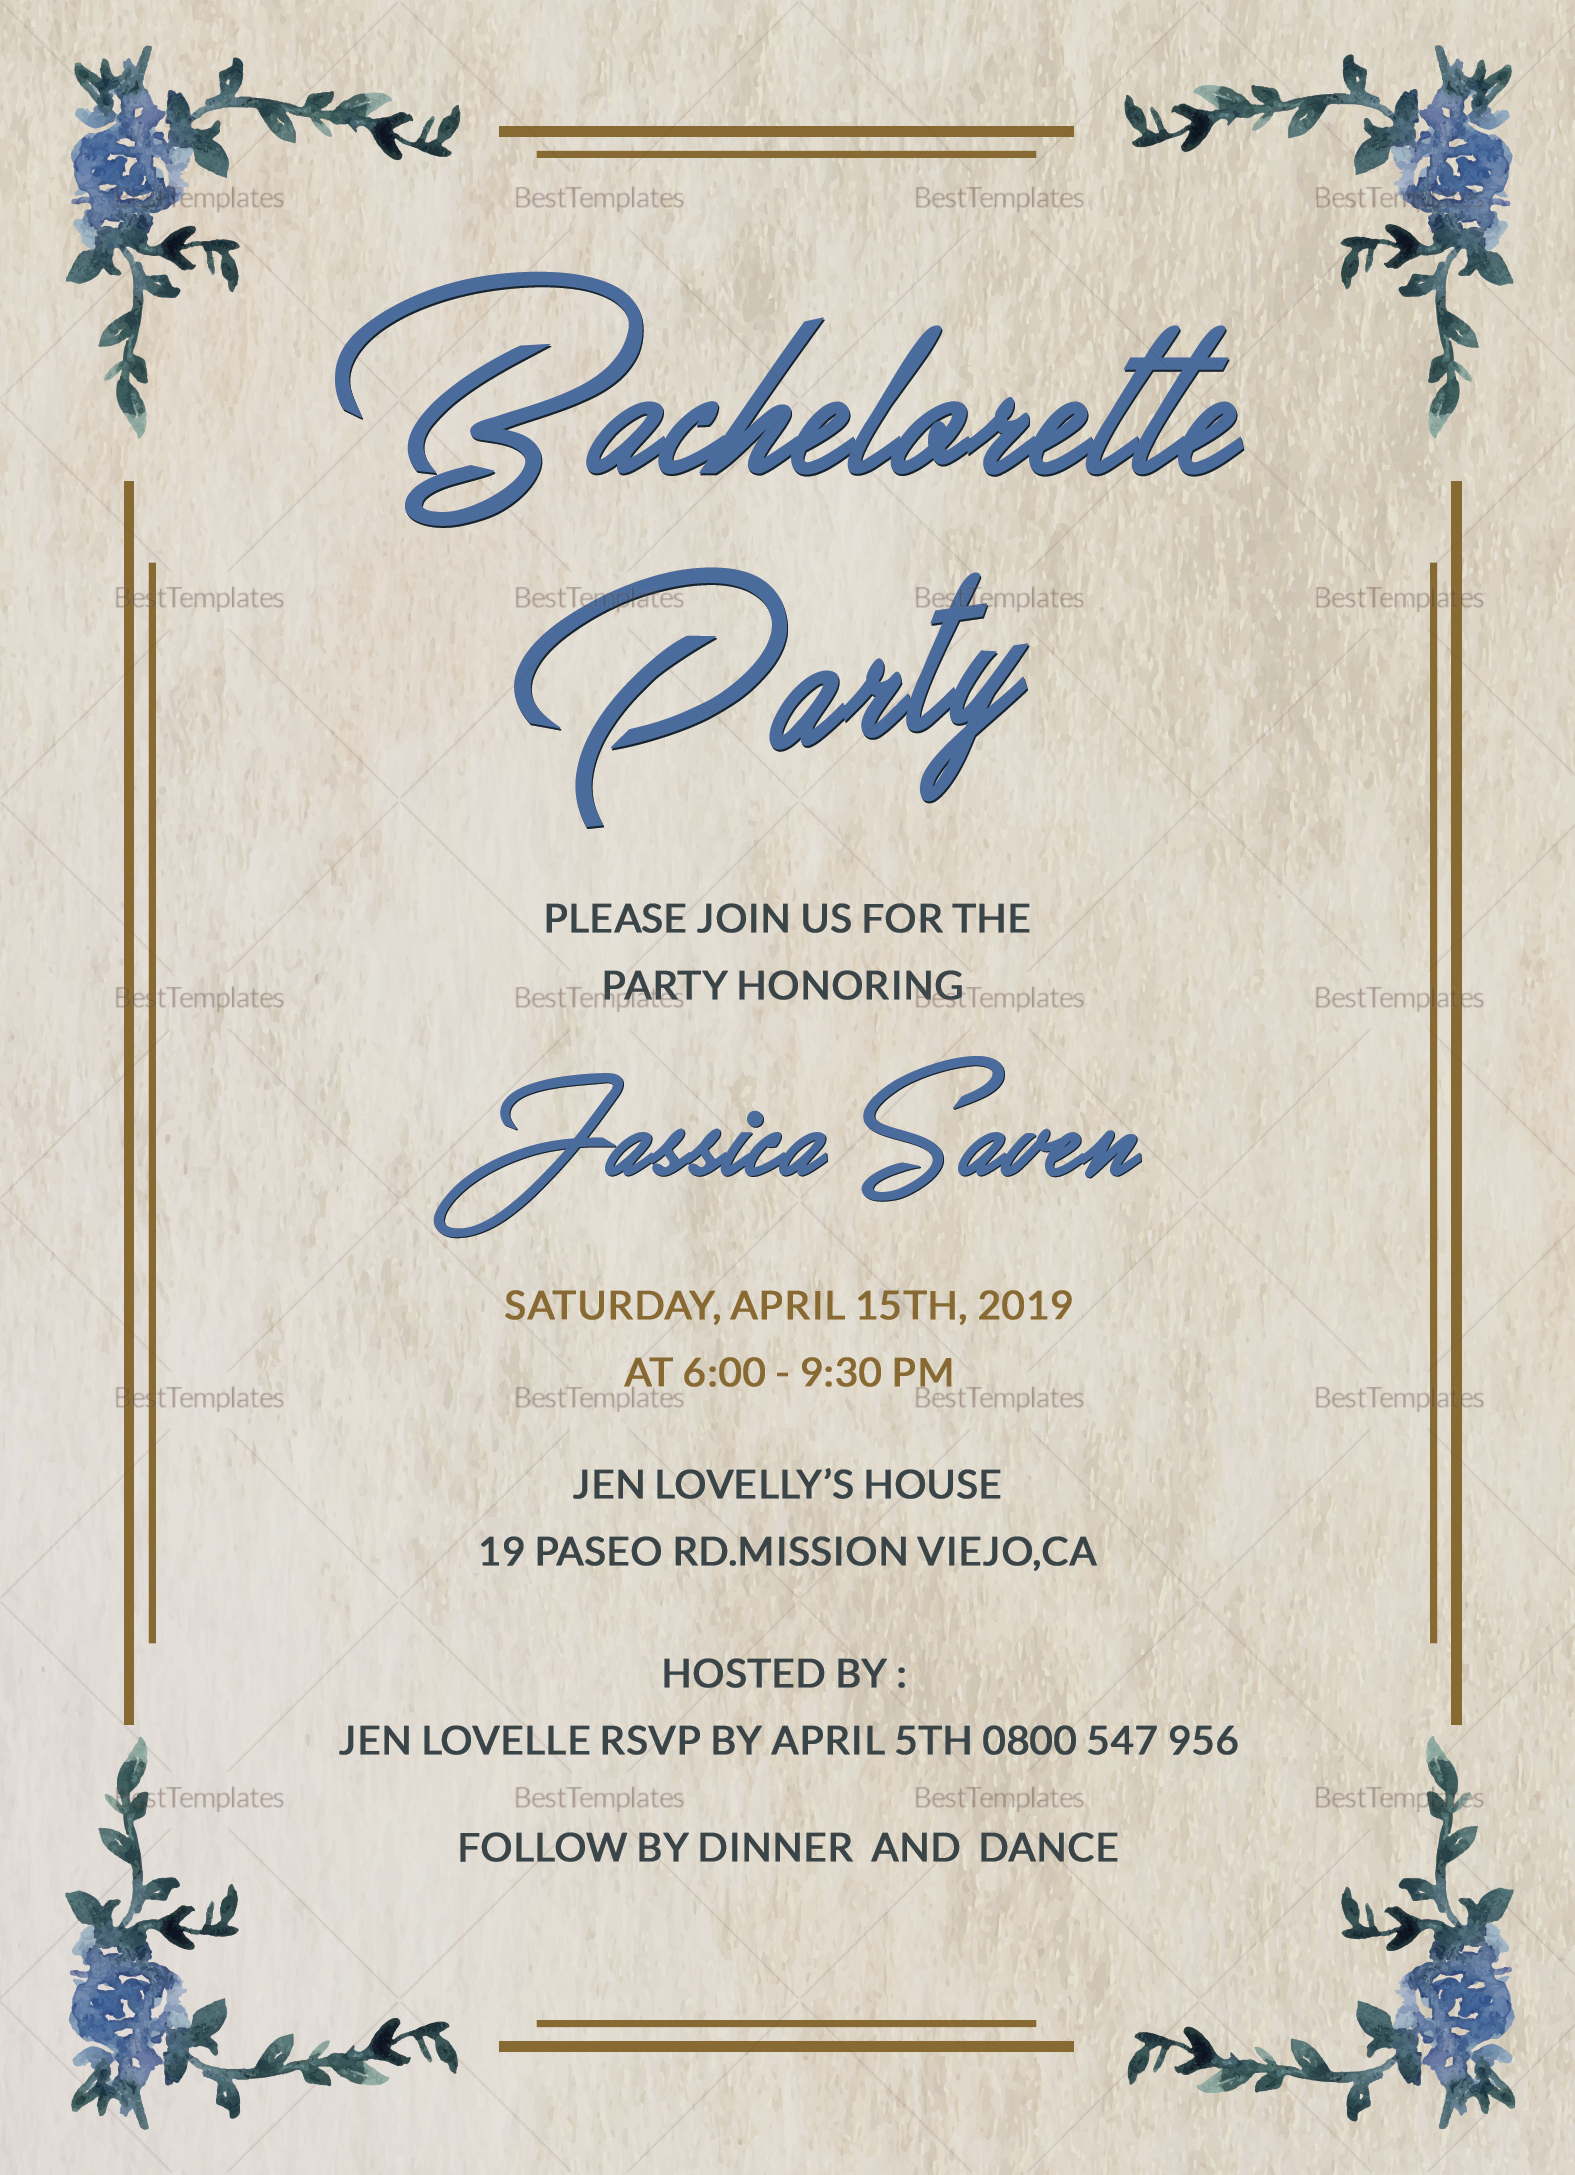 Floral Bachelorette Party Invitation Design Template